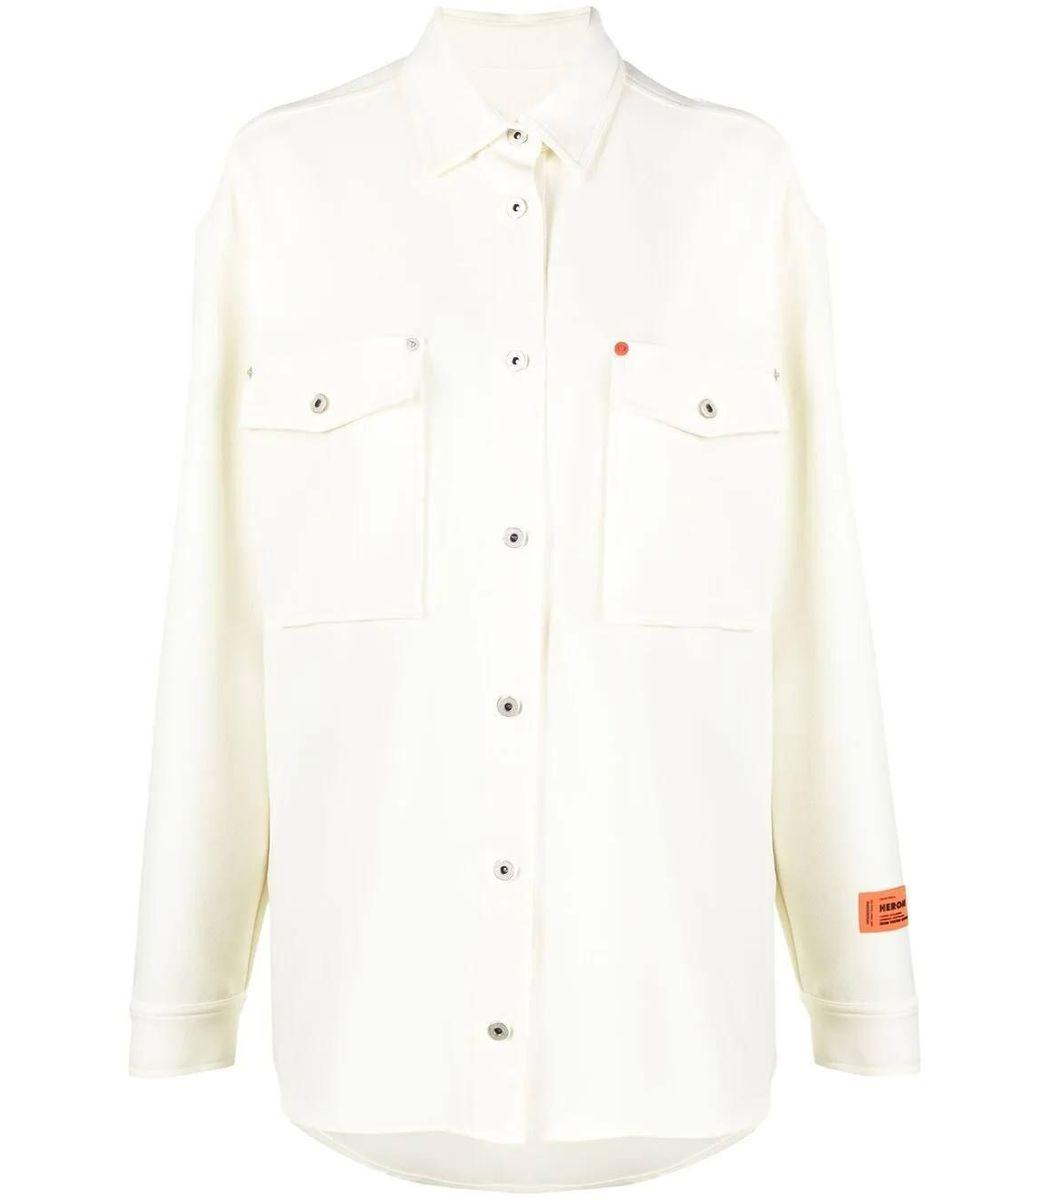 Heron Preston Shirts Pocket Detail Long Sleeve Button-up Shirt, Cream